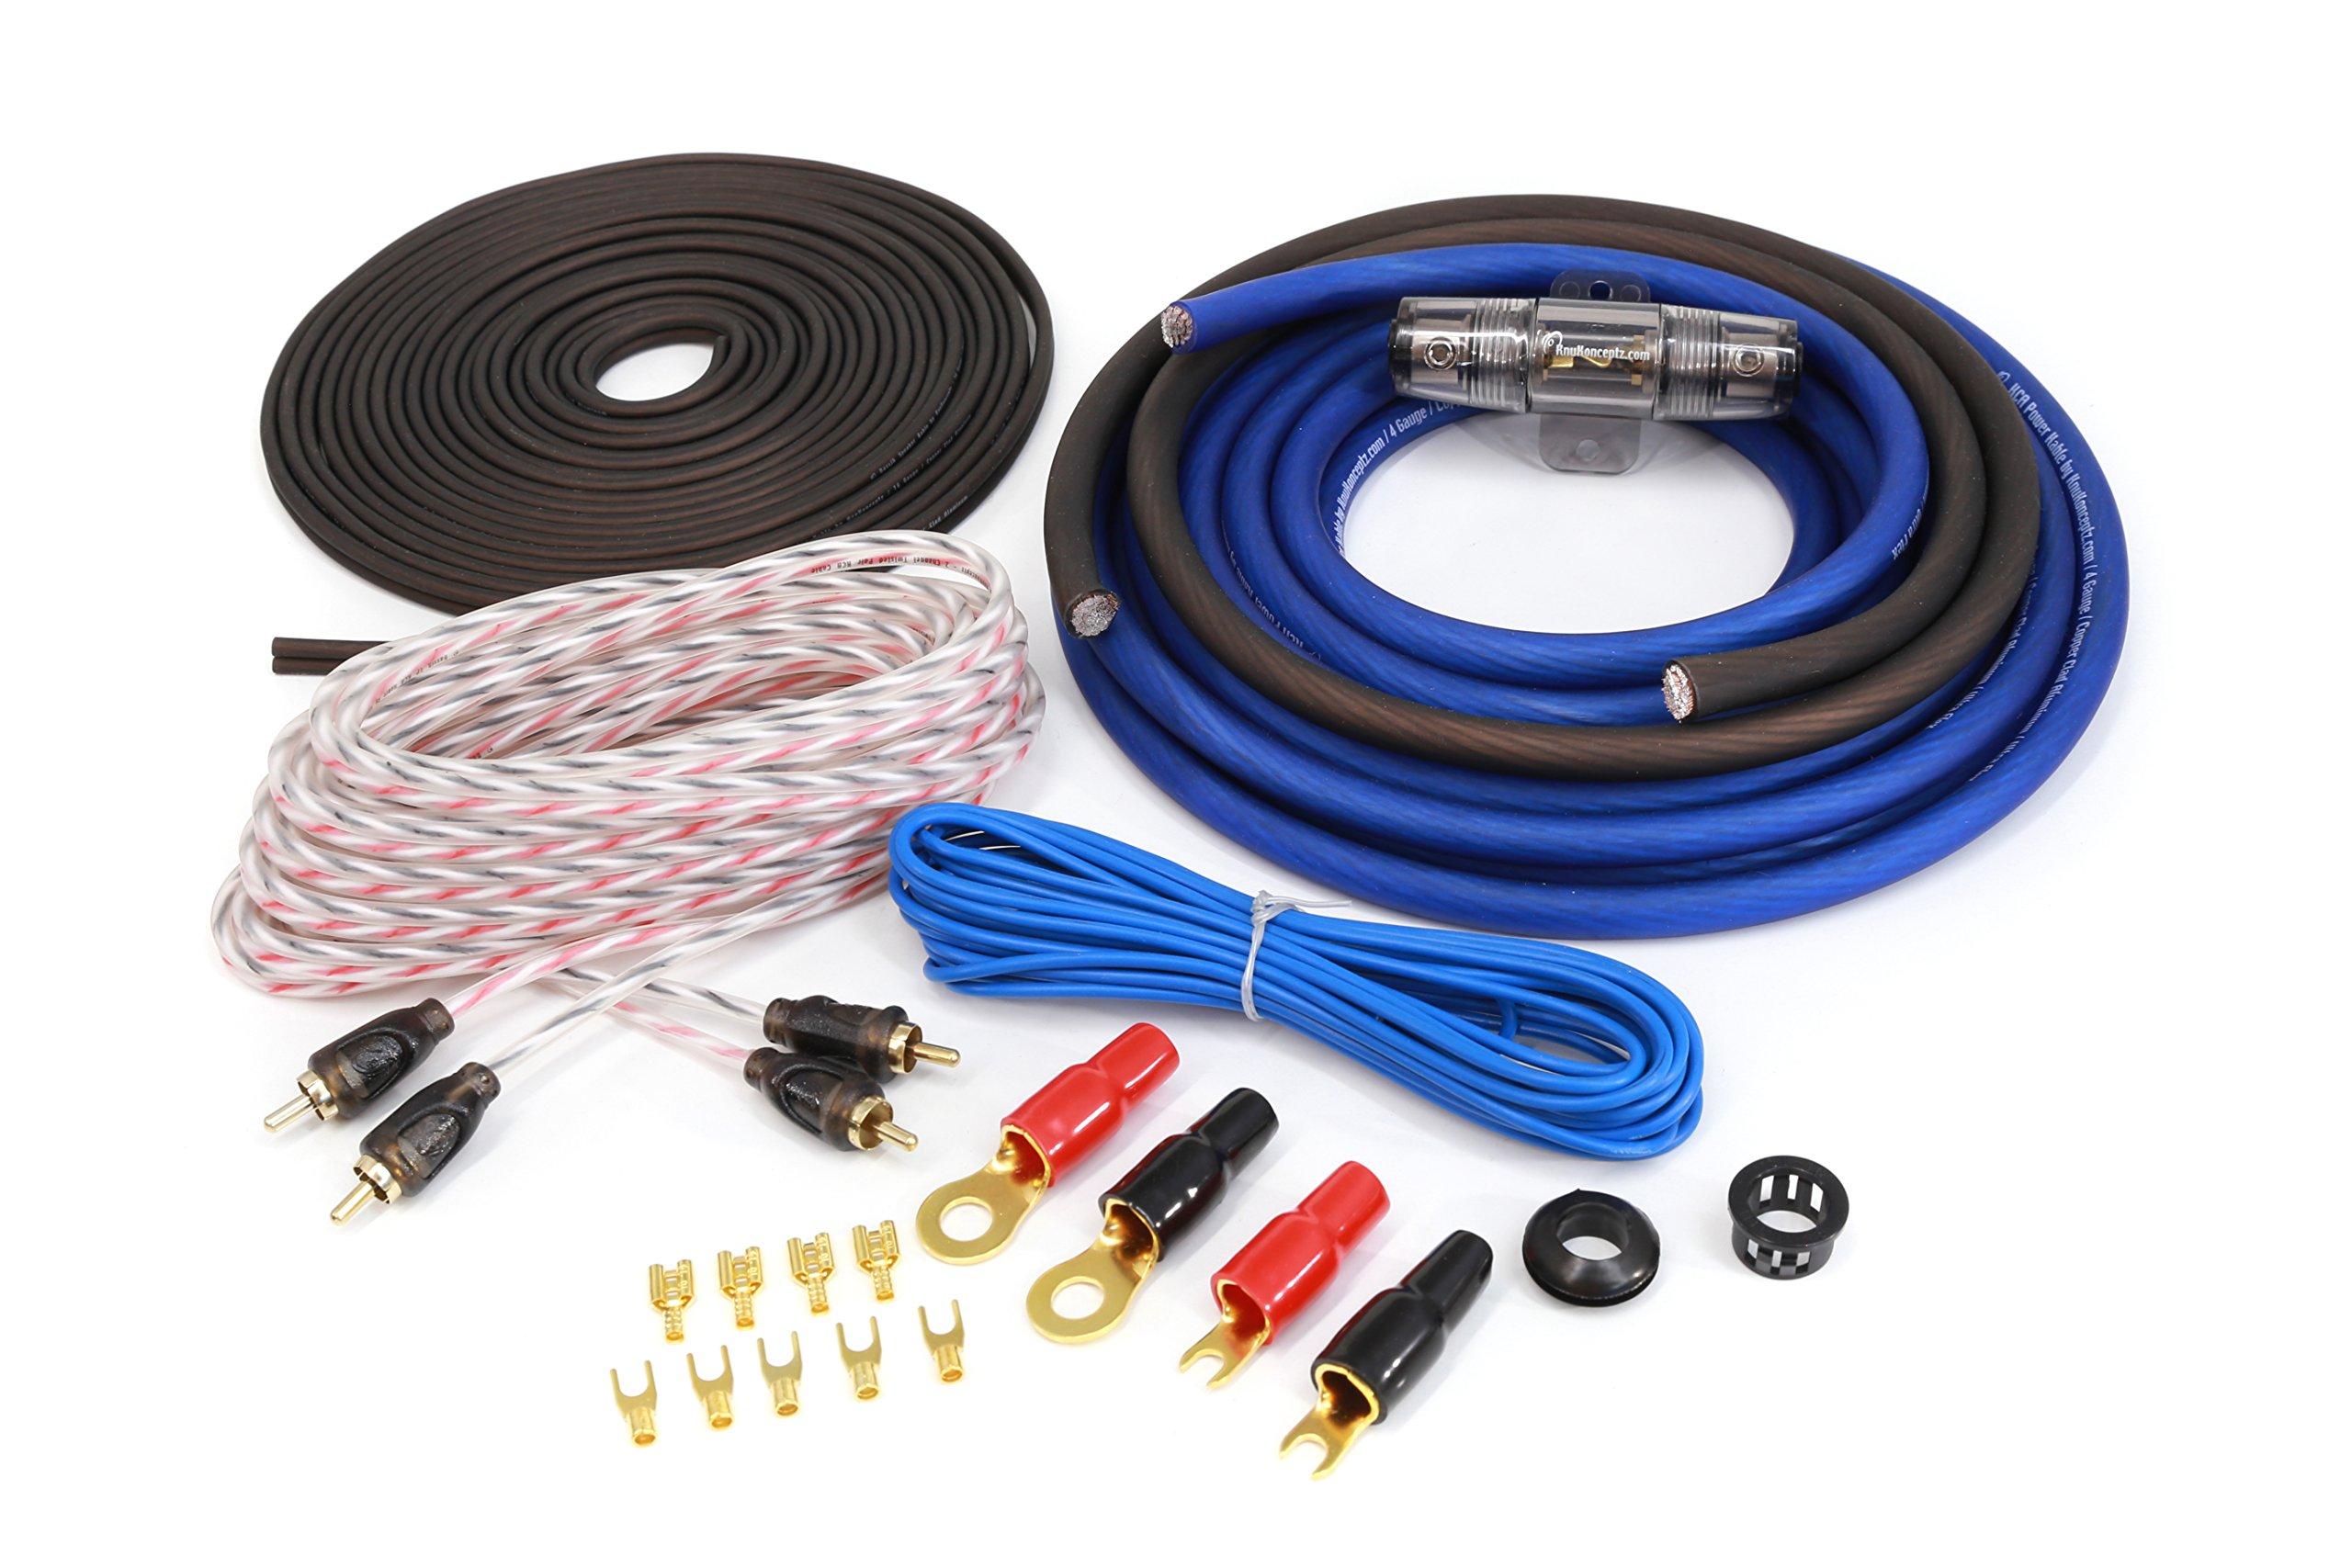 amazon com knukonceptz kca complete 4 gauge amp installation kit rh amazon com